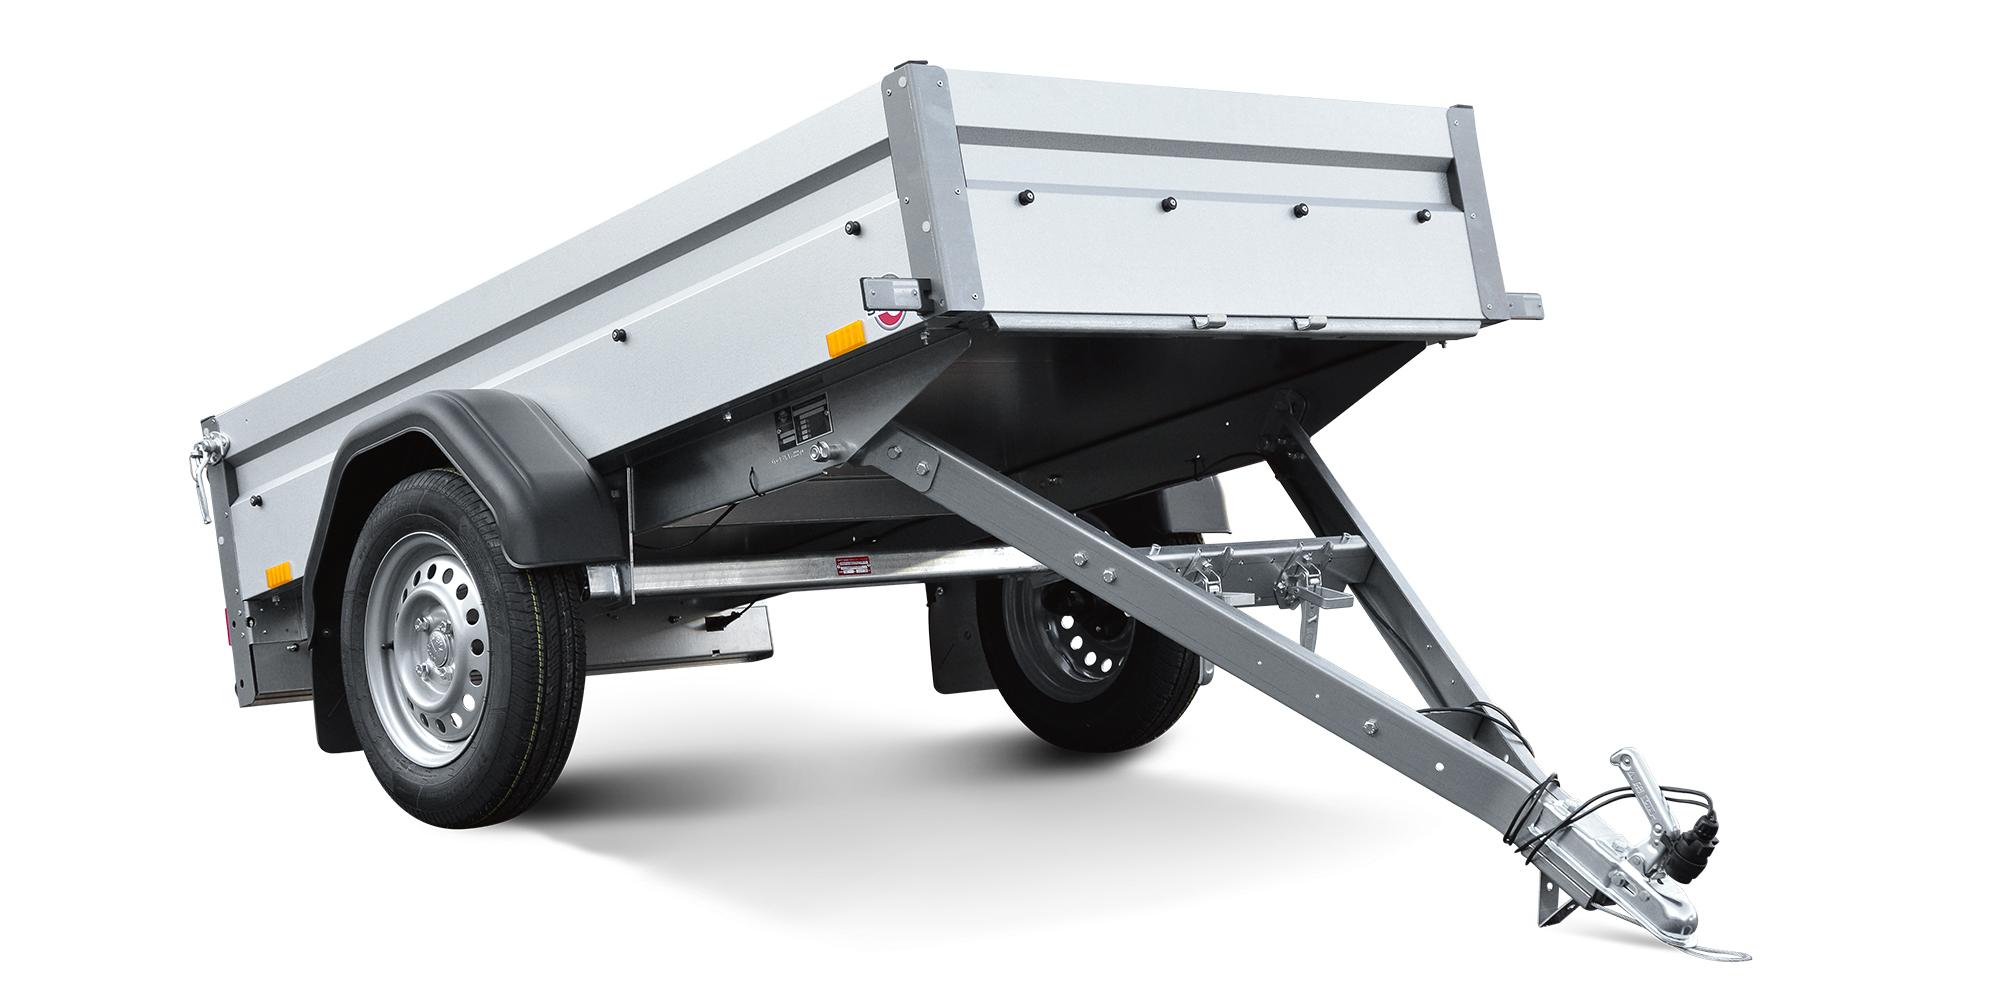 Trailer Direct - STEMA Anhänger Sortiment kaufen - FT 7.5-20-10.1B ...